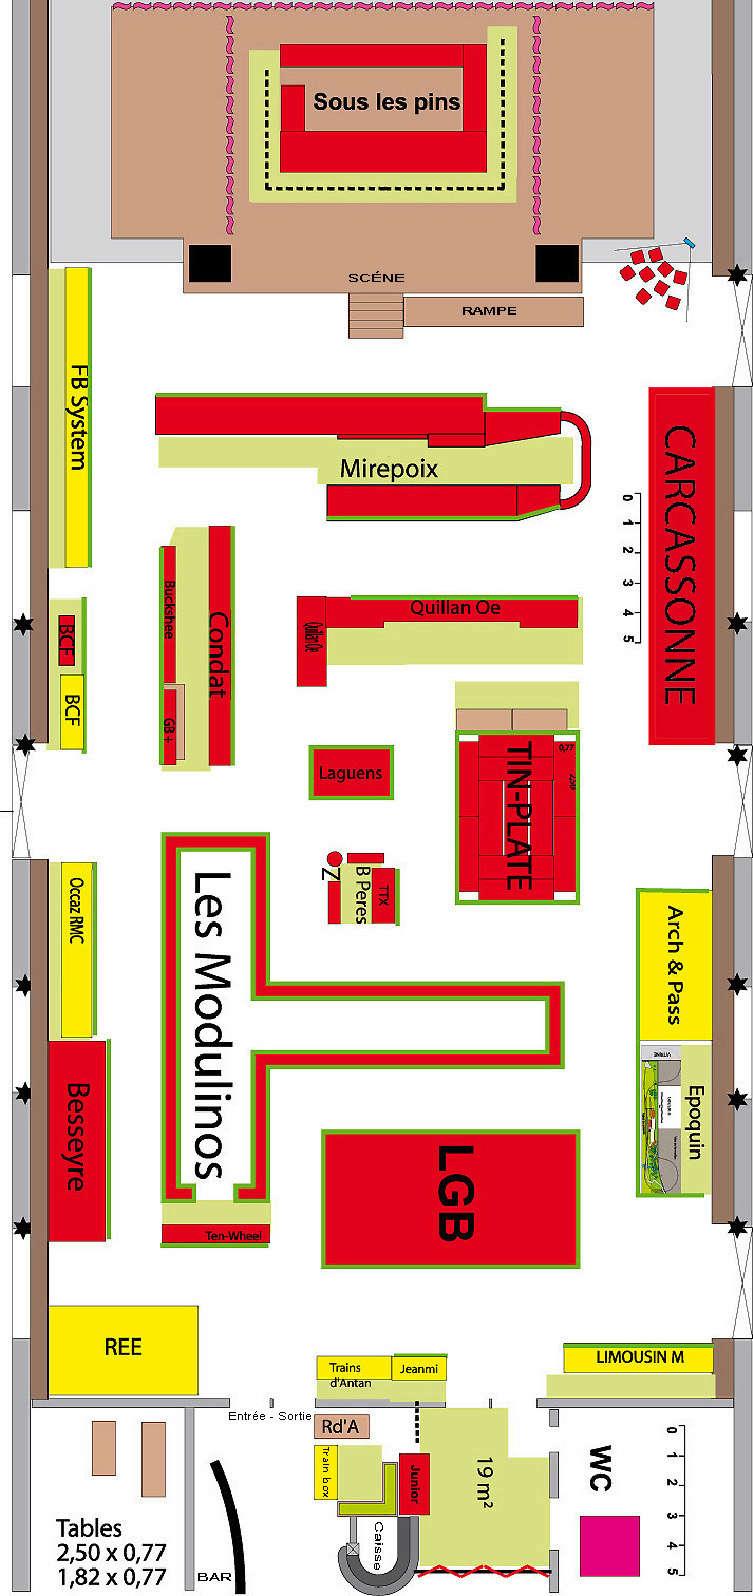 2e Expo ferroviaire du RMC les 28 & 29 octobre 2017- Castres 201710